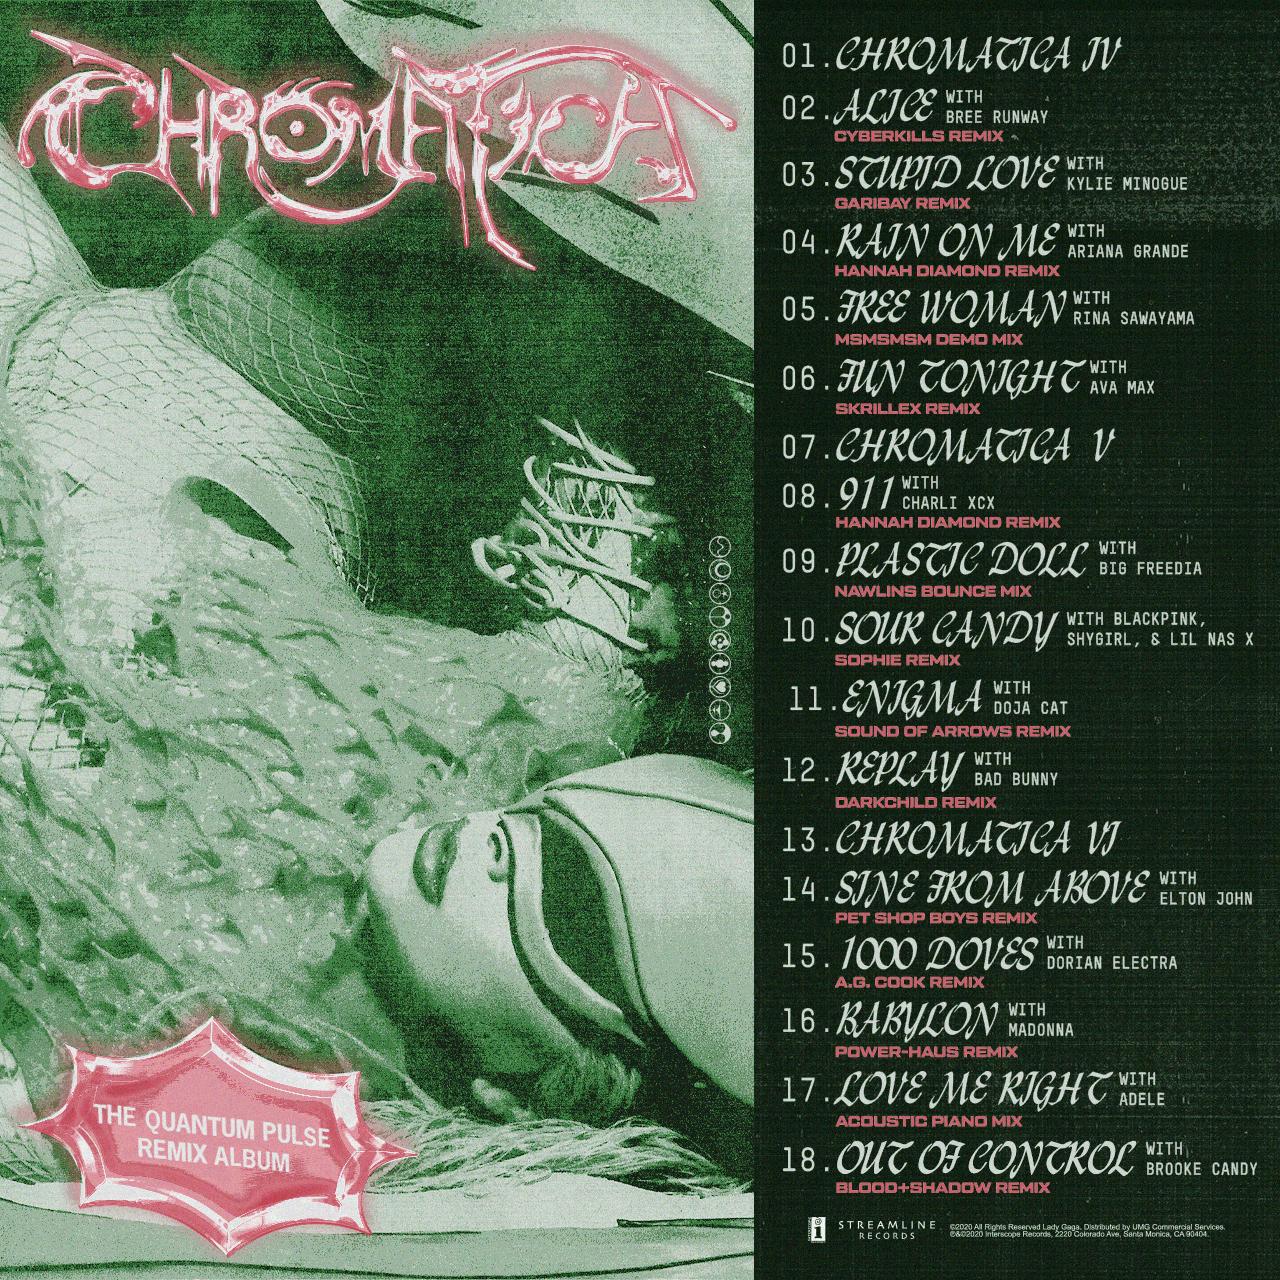 Chromatica-Remix-copy.jpg